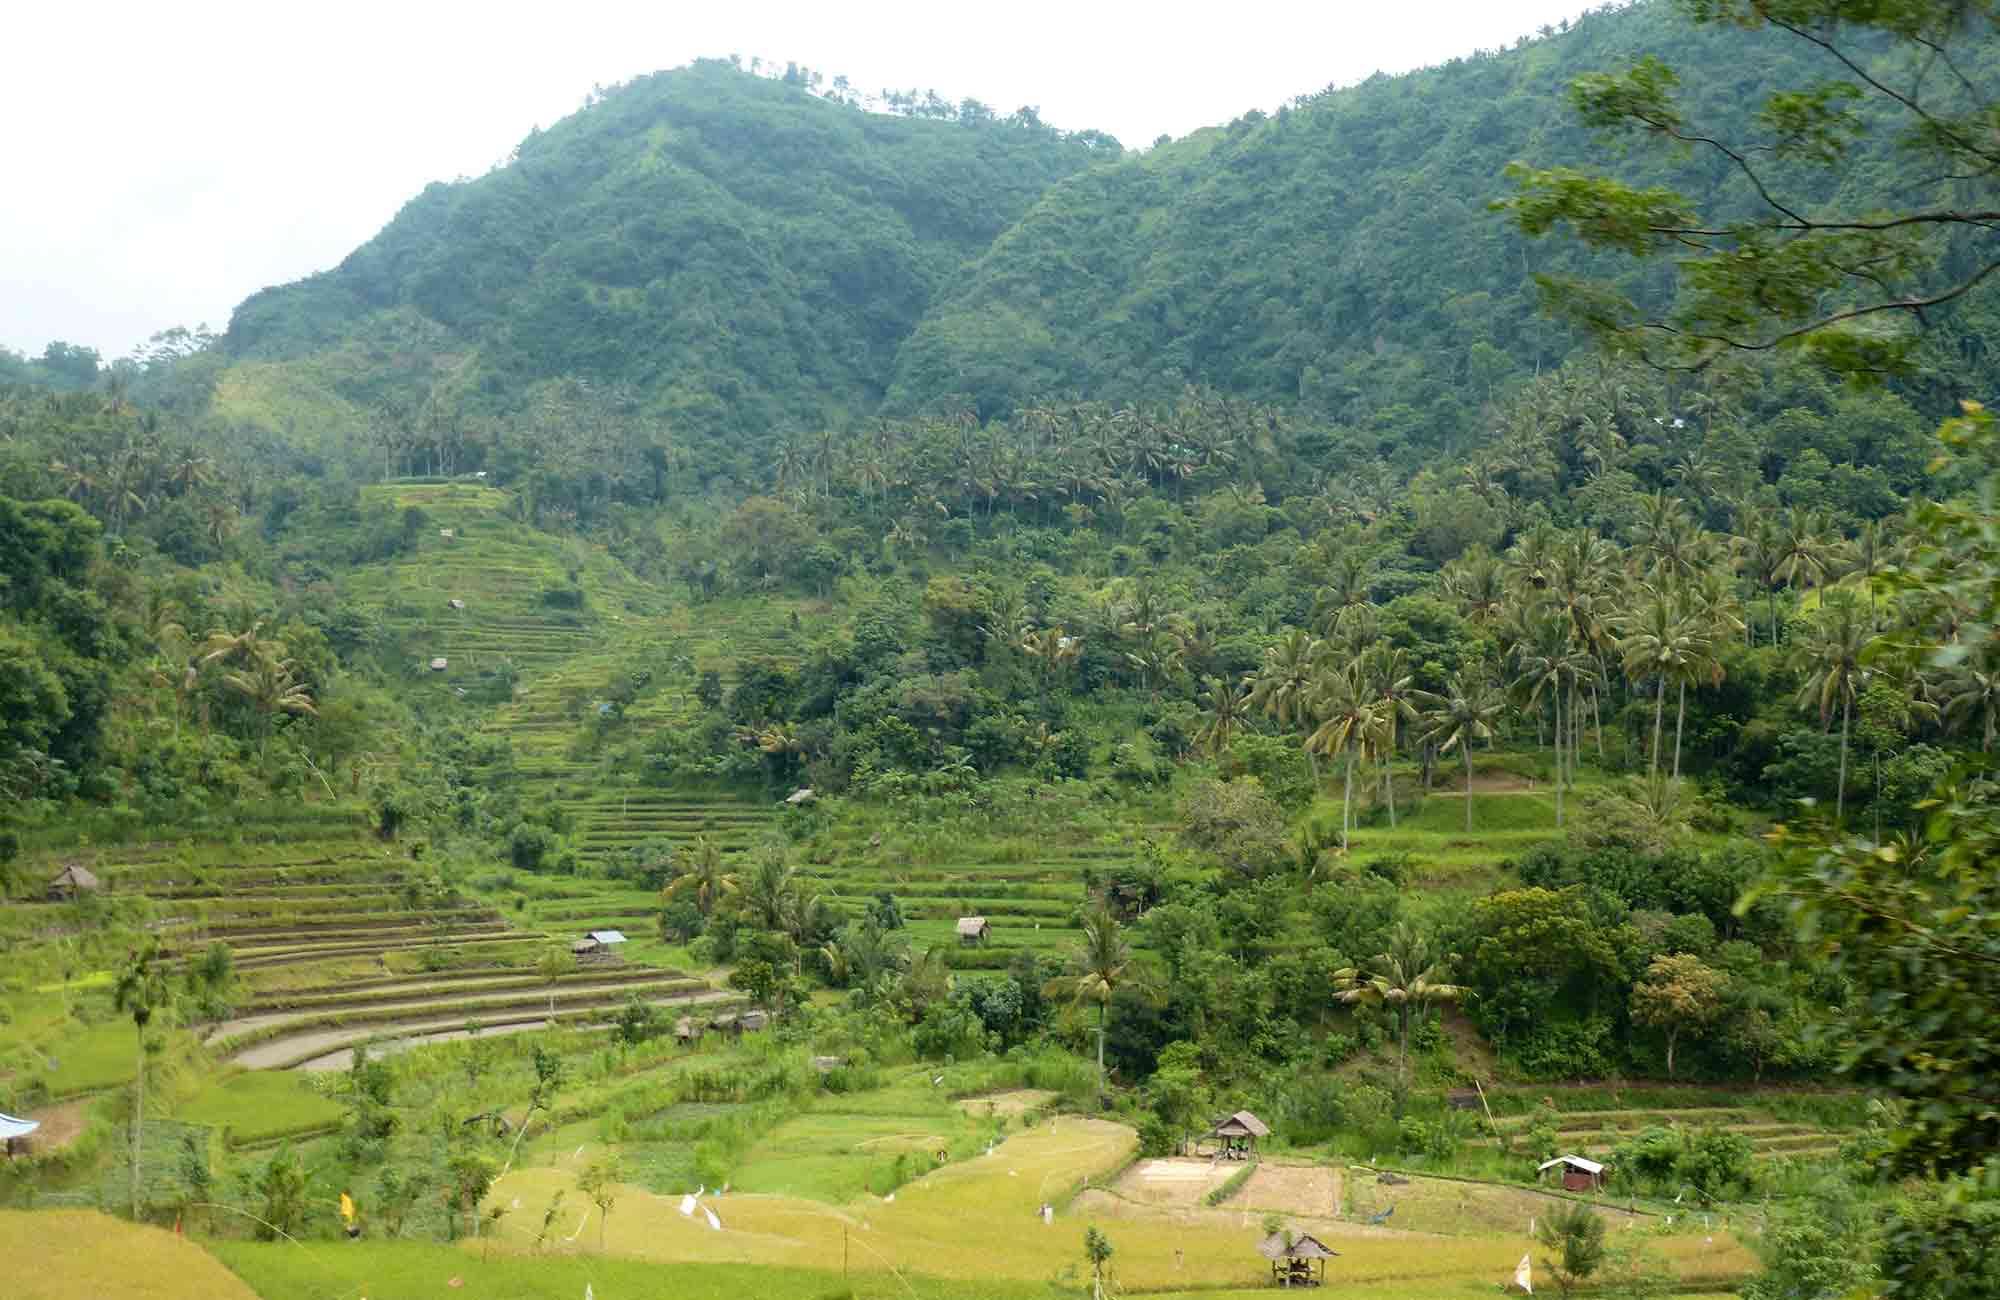 Voyage Indonésie - Rizières Bali - Amplitudes